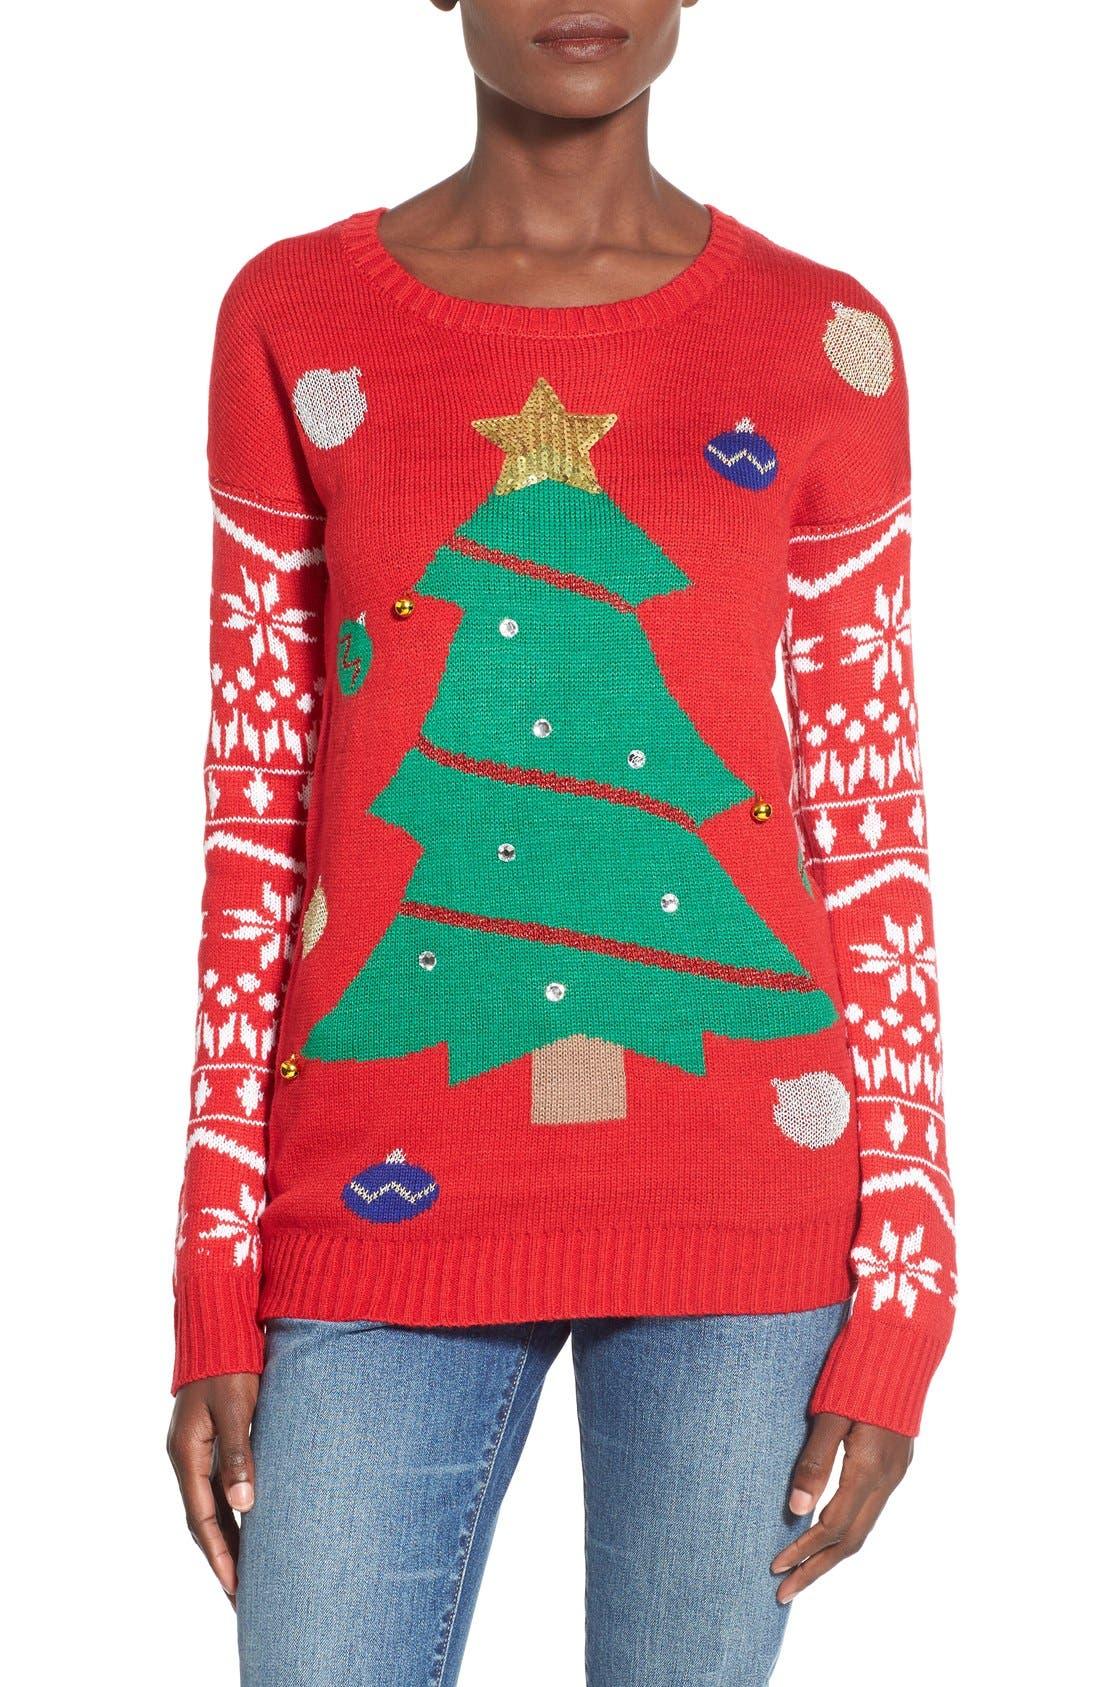 Alternate Image 1 Selected - Derek Heart Tree Ornament Christmas Sweater